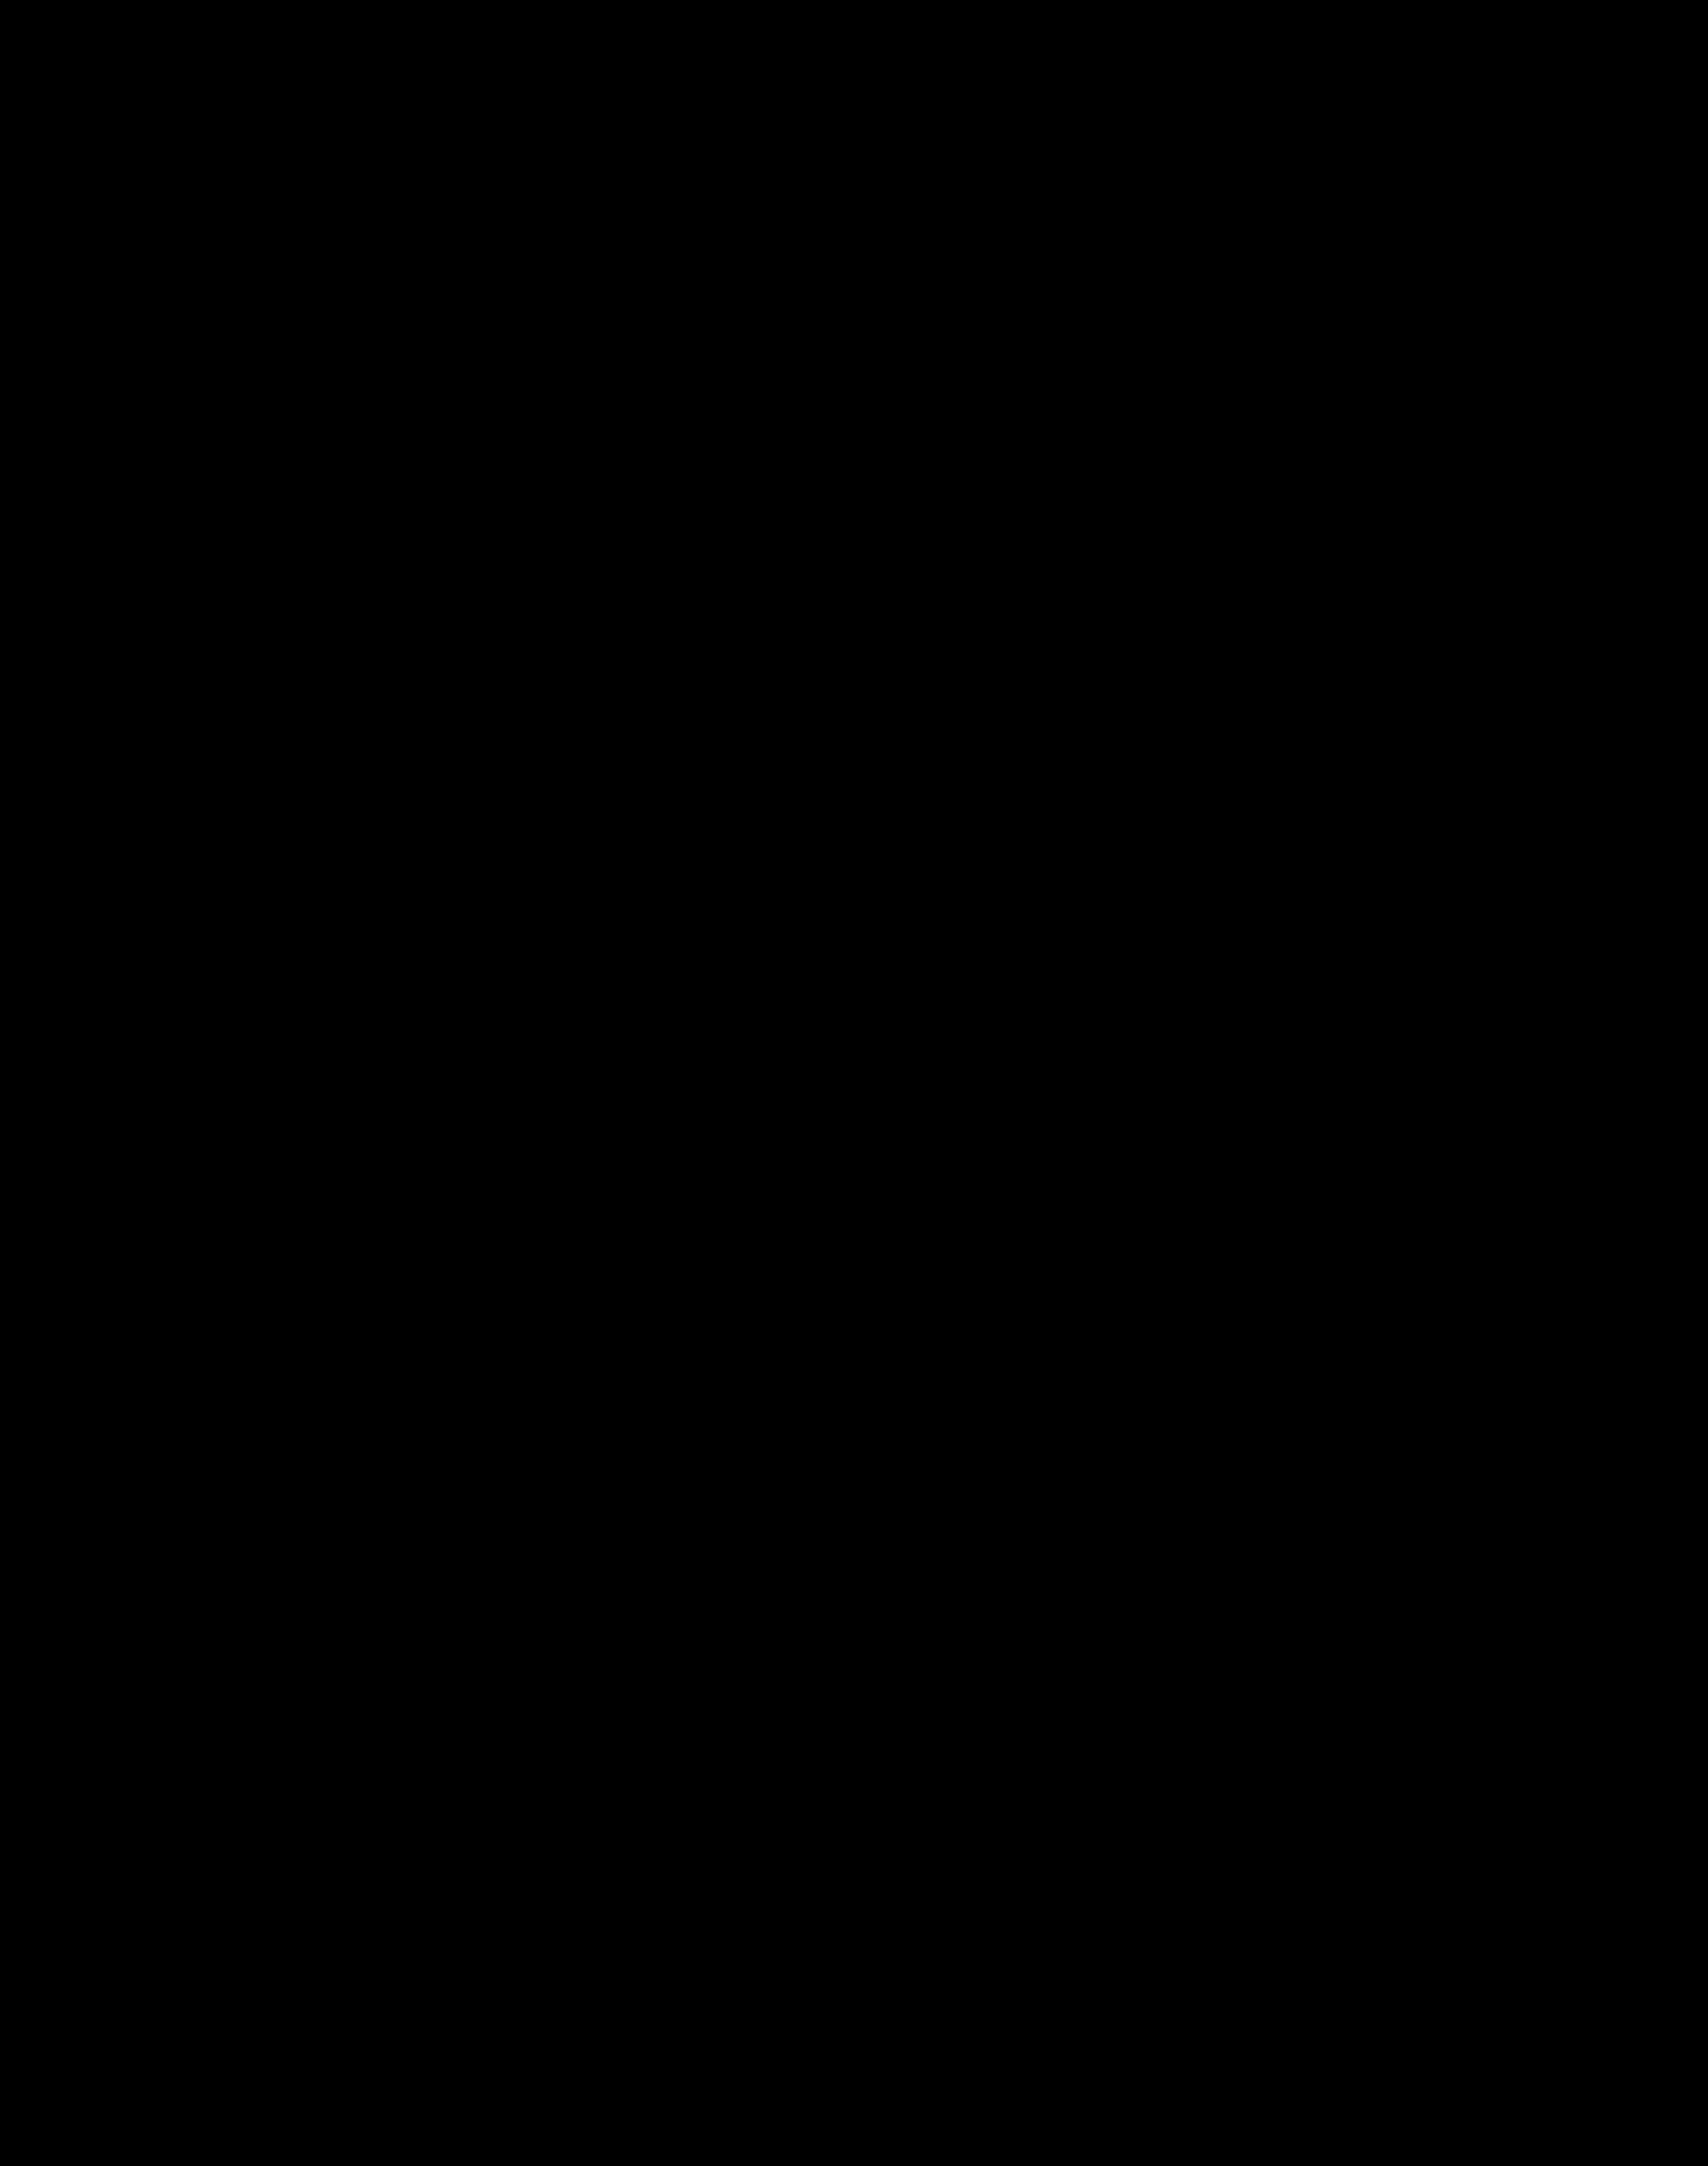 Flying crow silhouette clip art proj gn nimh